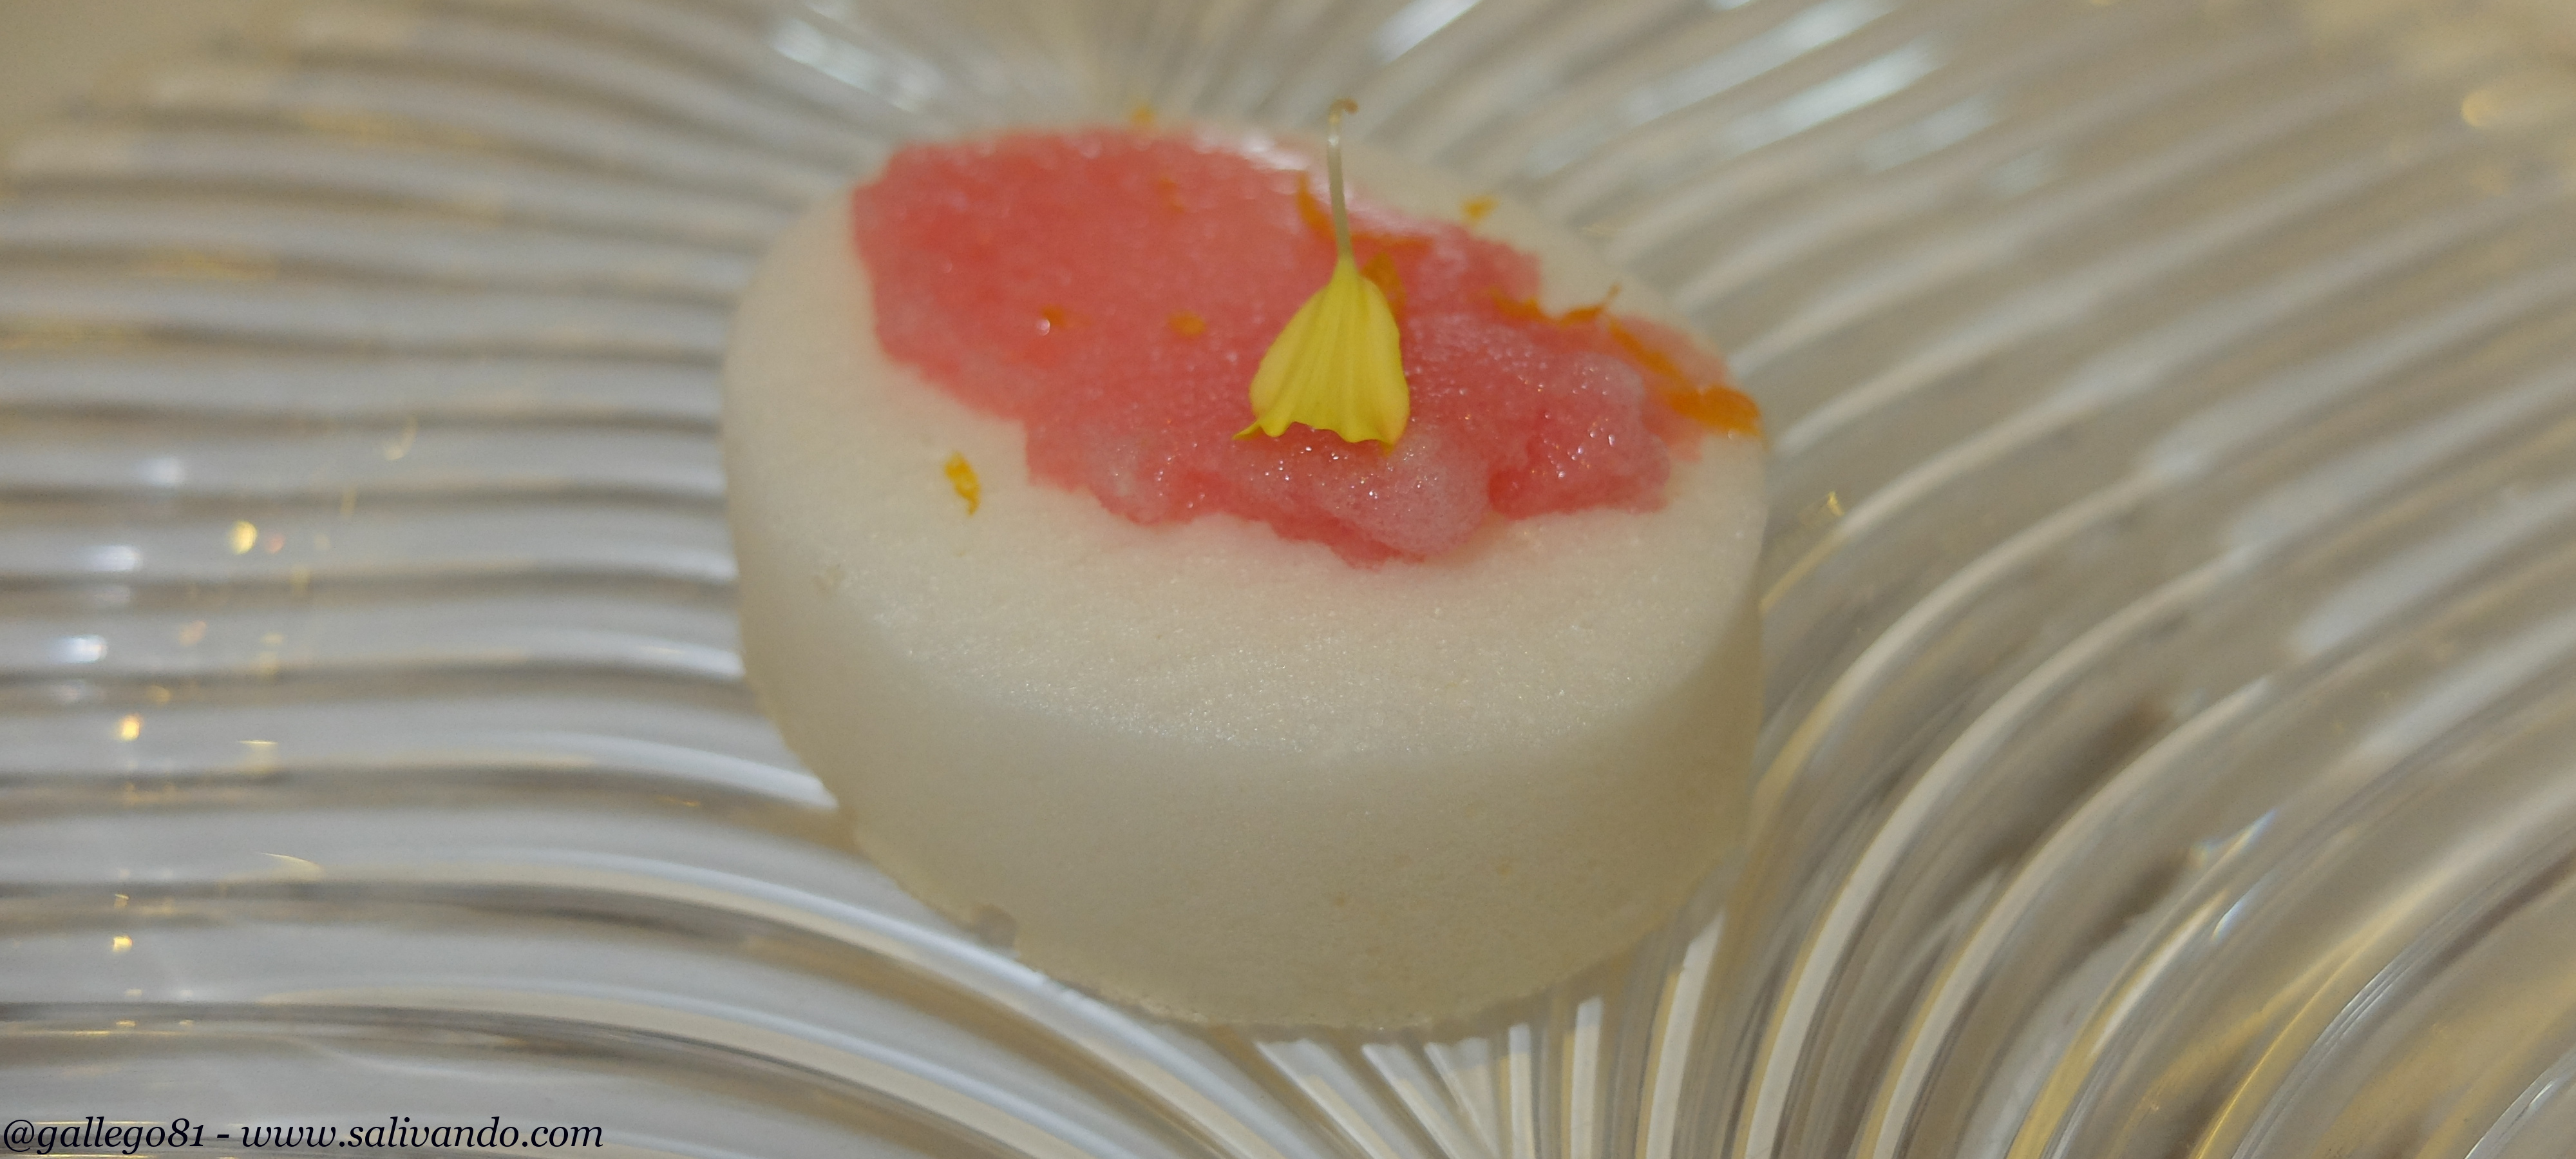 Tarta de manzana 2012